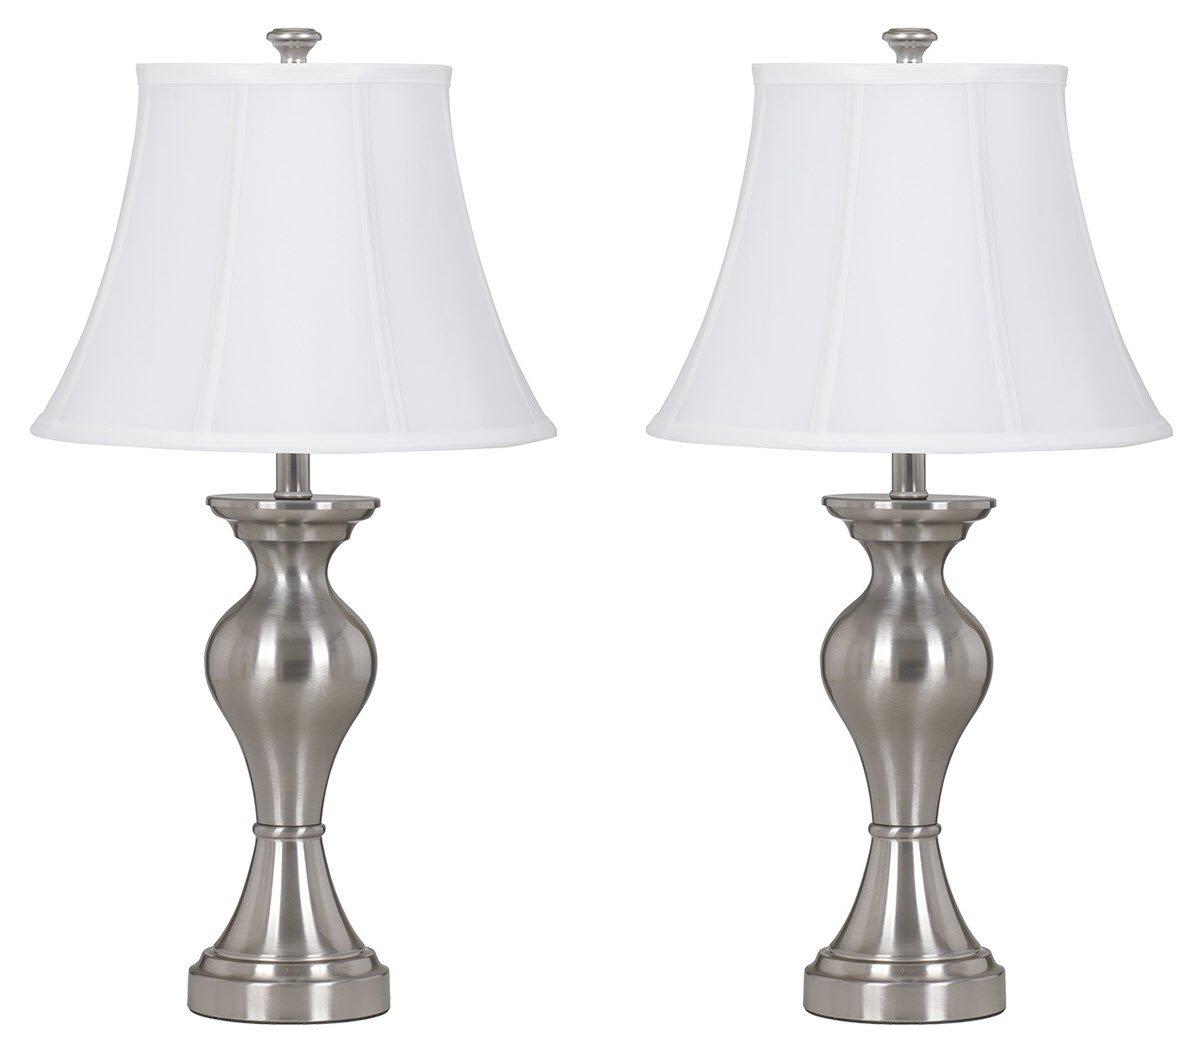 Ashley Furniture Signature Design - Rishona Metal Table Lamps - Set of 2 - Brushed Silver Finish